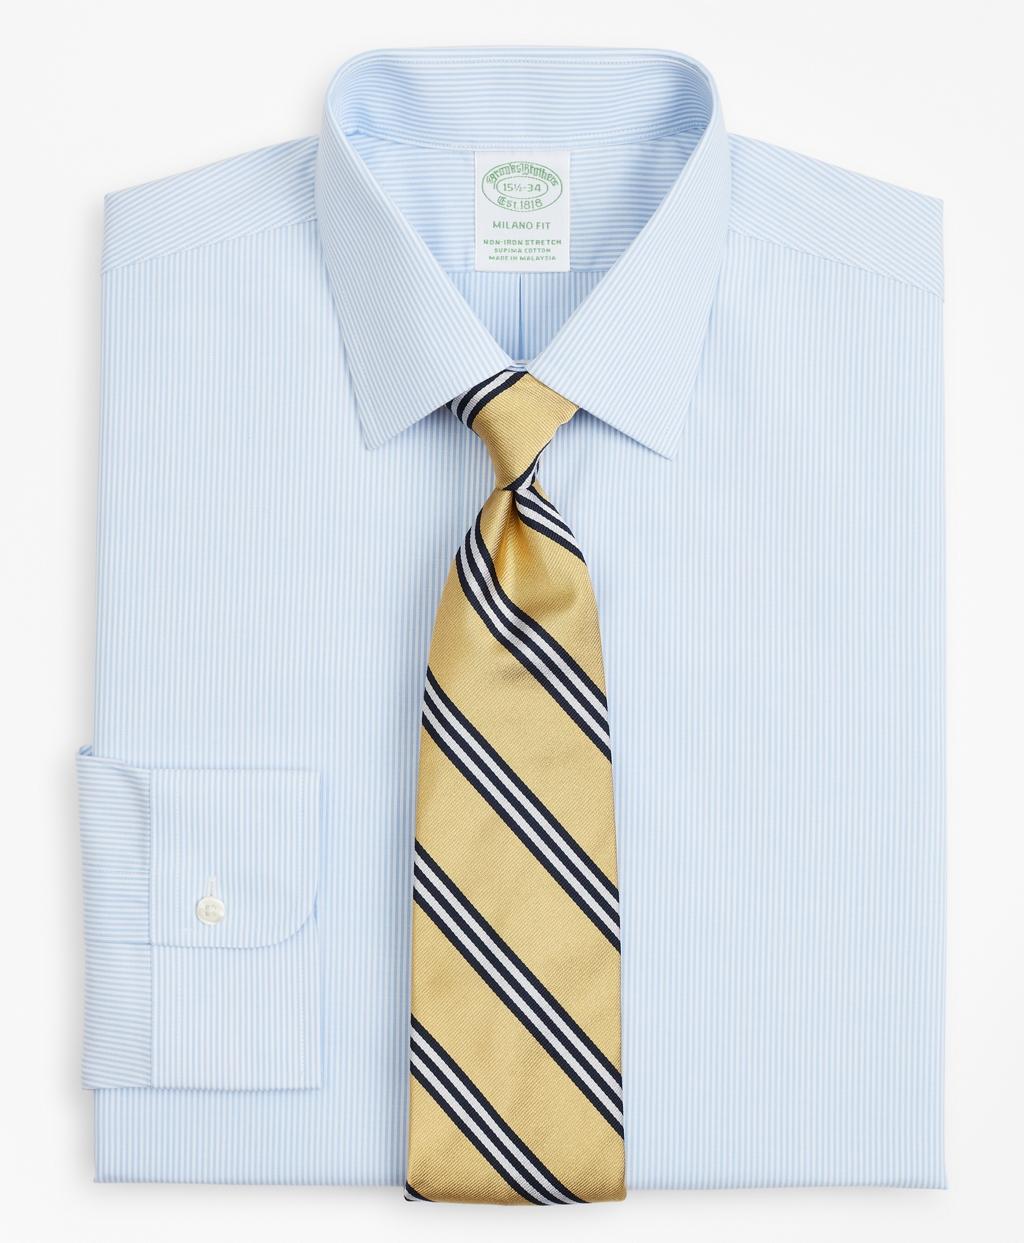 Brooksbrothers Stretch Milano Slim-Fit Dress Shirt, Non-Iron Poplin Ainsley Collar Fine Stripe